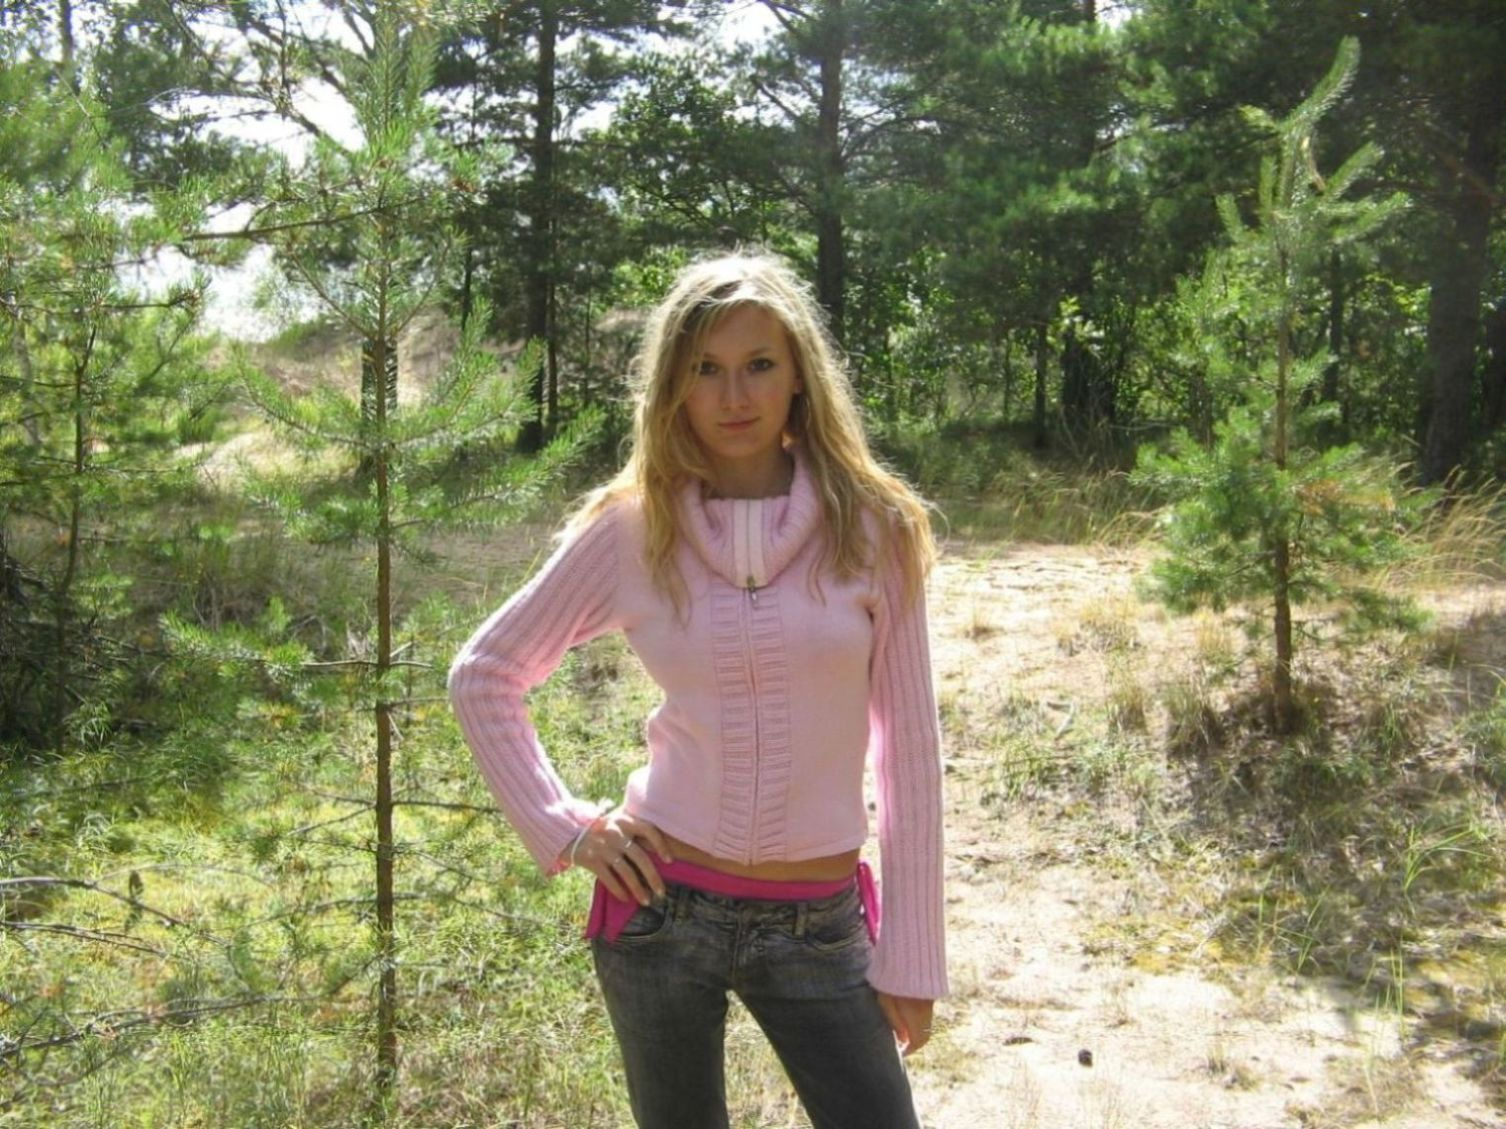 Sandra, 24 Jahre, Freburg: Dumm fickt gut – Intelligenz fickt richtig dreckig